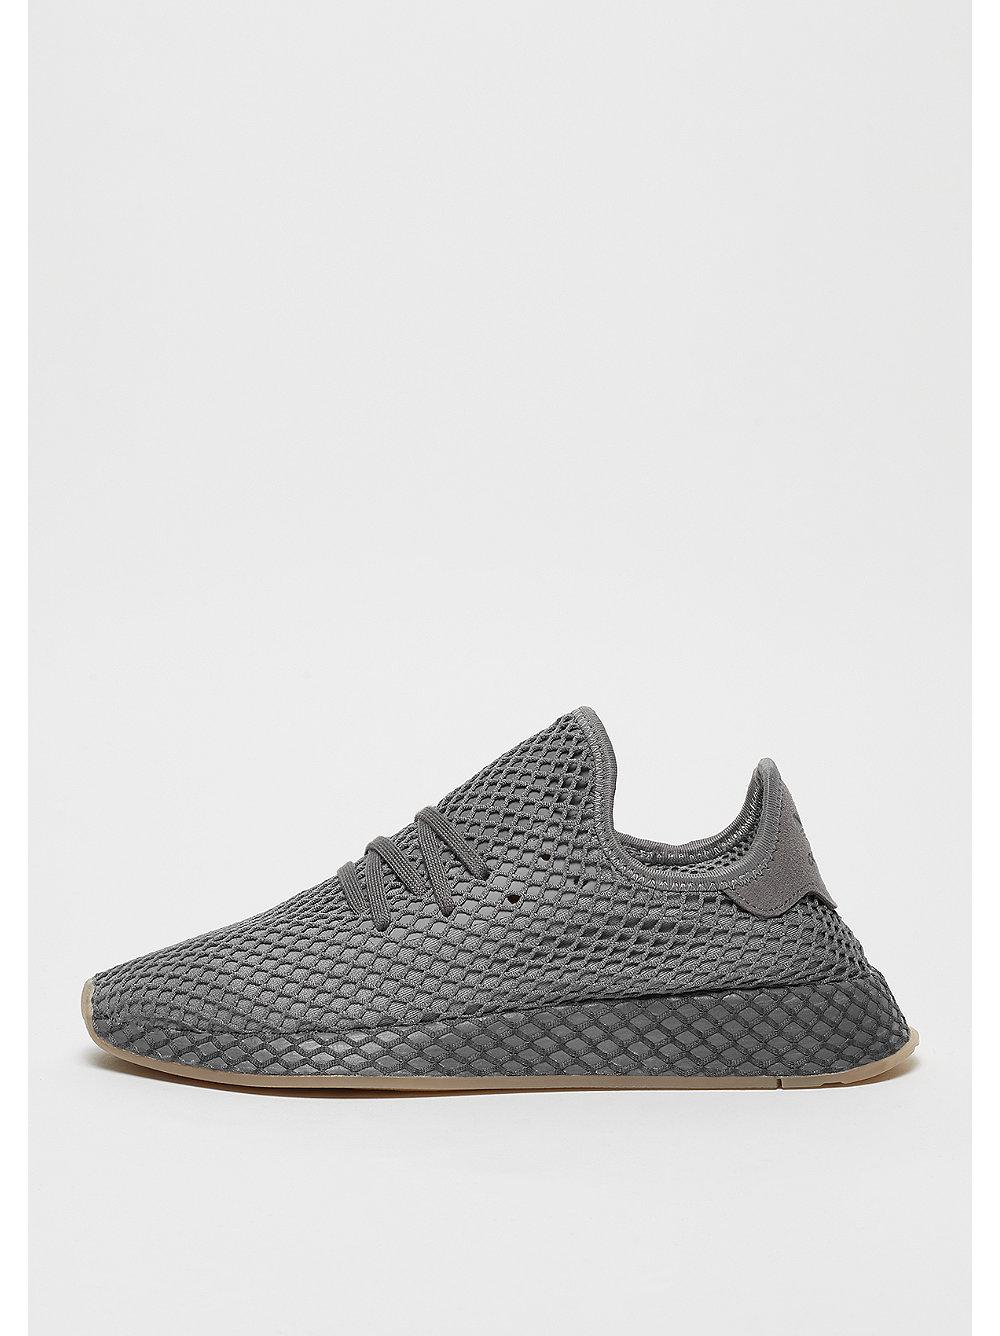 3810d34eecbf adidas Deerupt Runner grey three grey four ftwr white